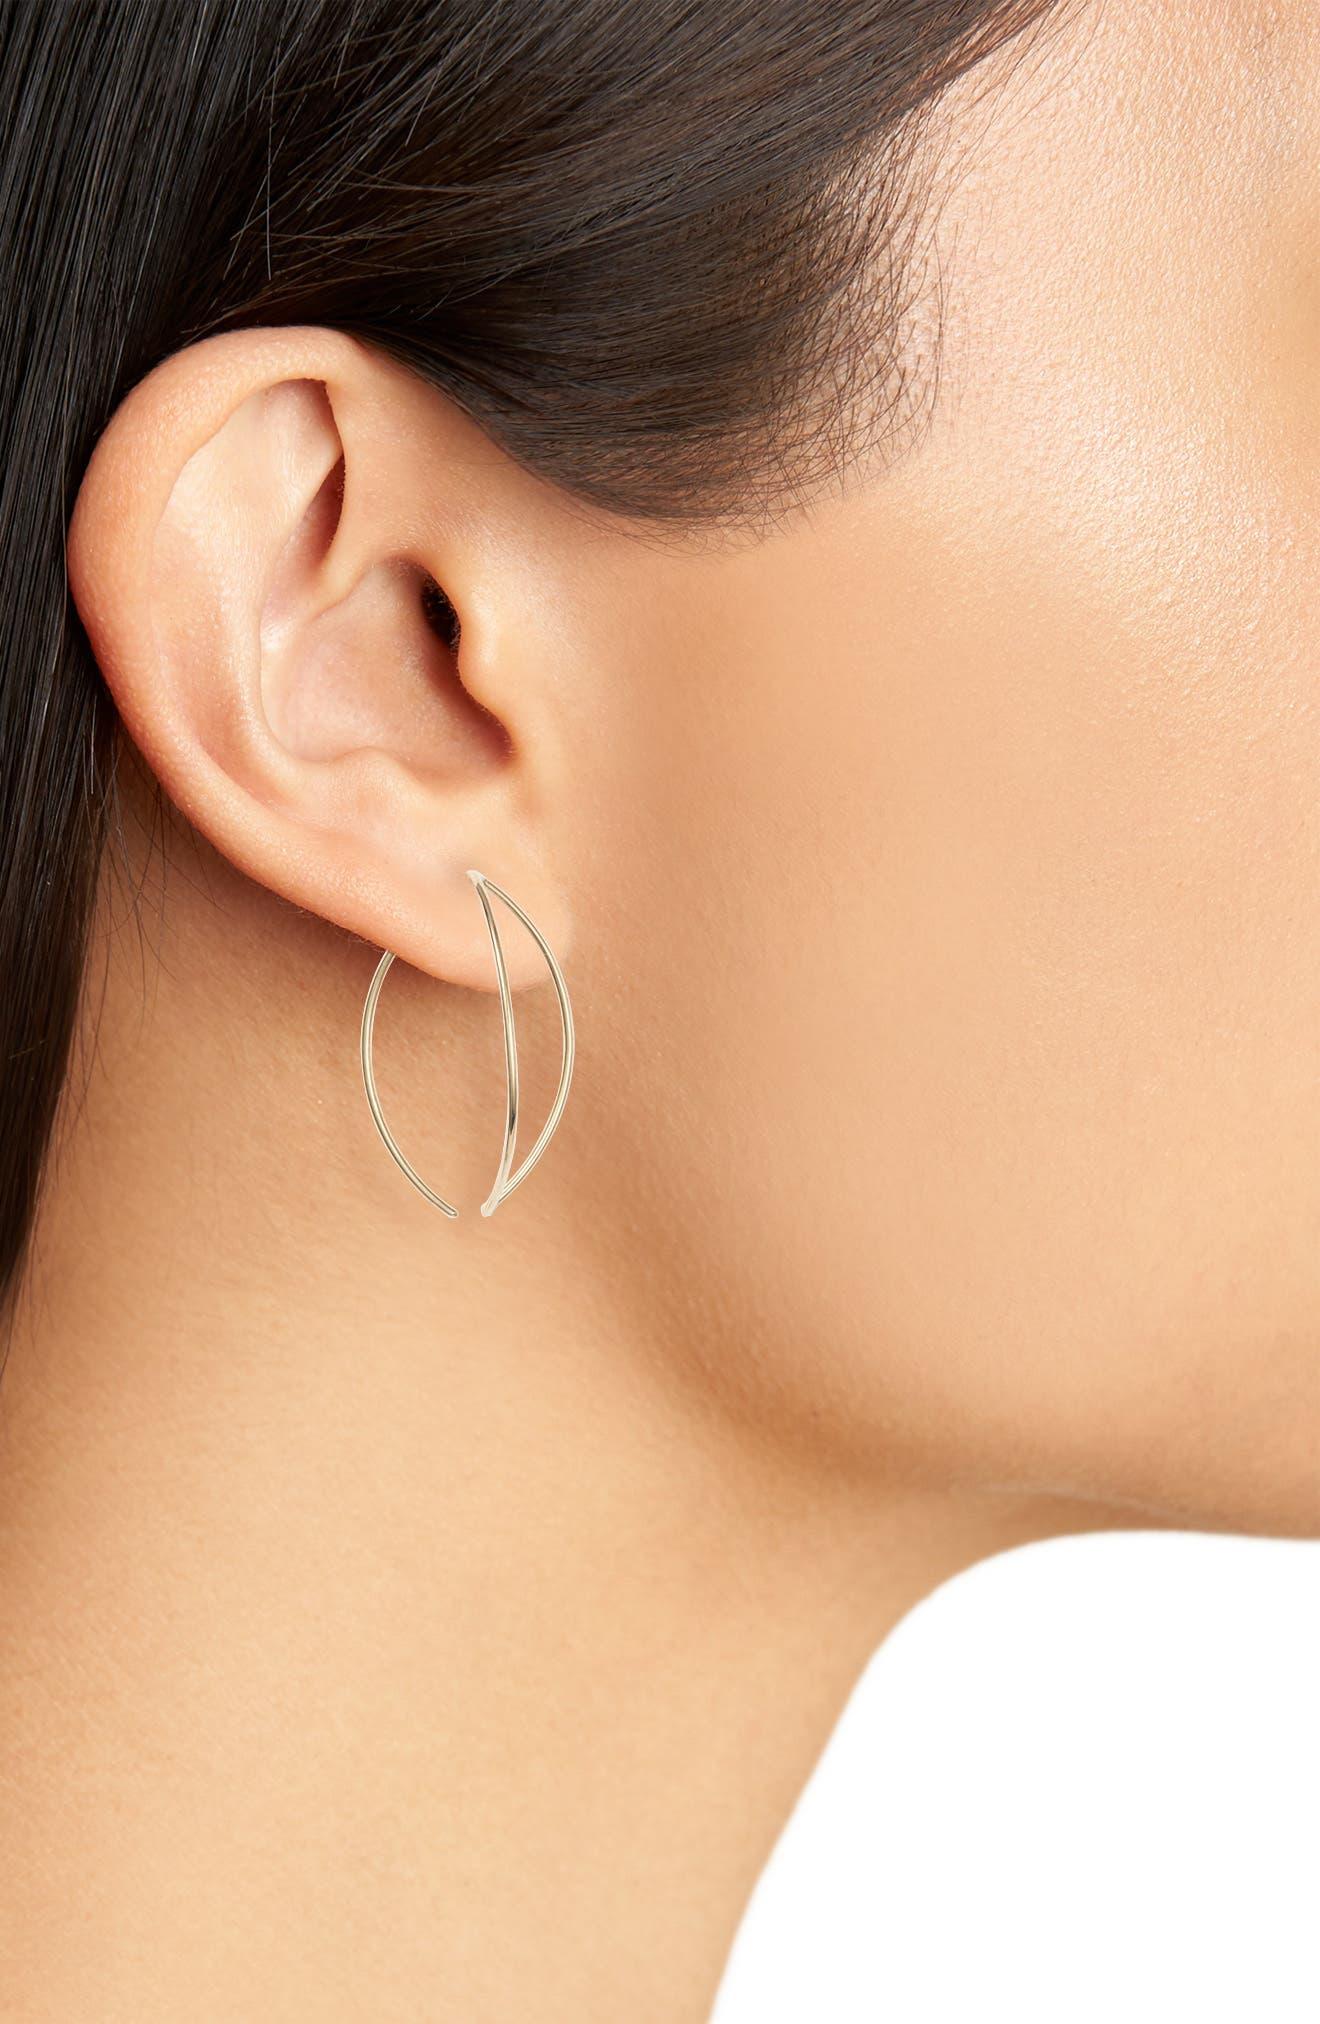 Oval Earrings,                             Alternate thumbnail 2, color,                             GOLD